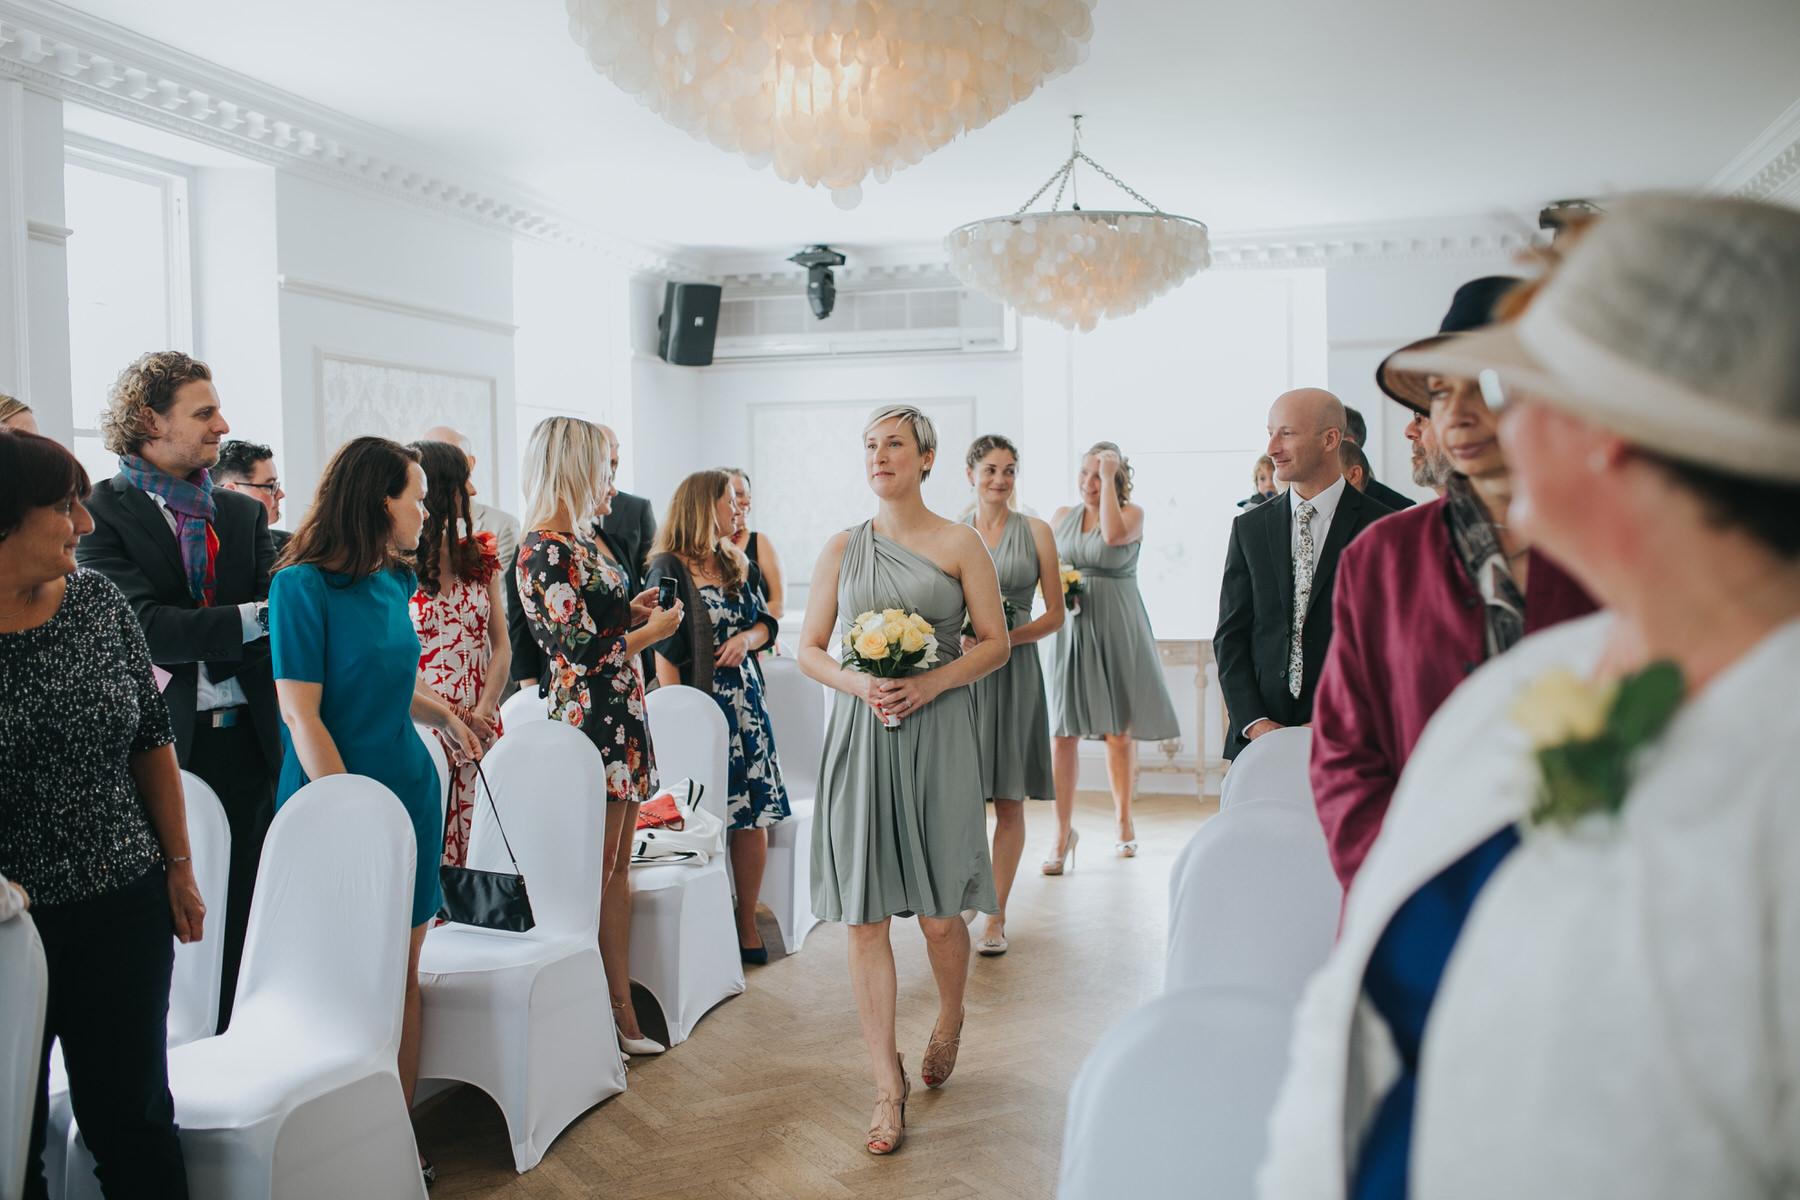 84 bridesmaids coming down aisle Belair House wedding ceremony.jpg